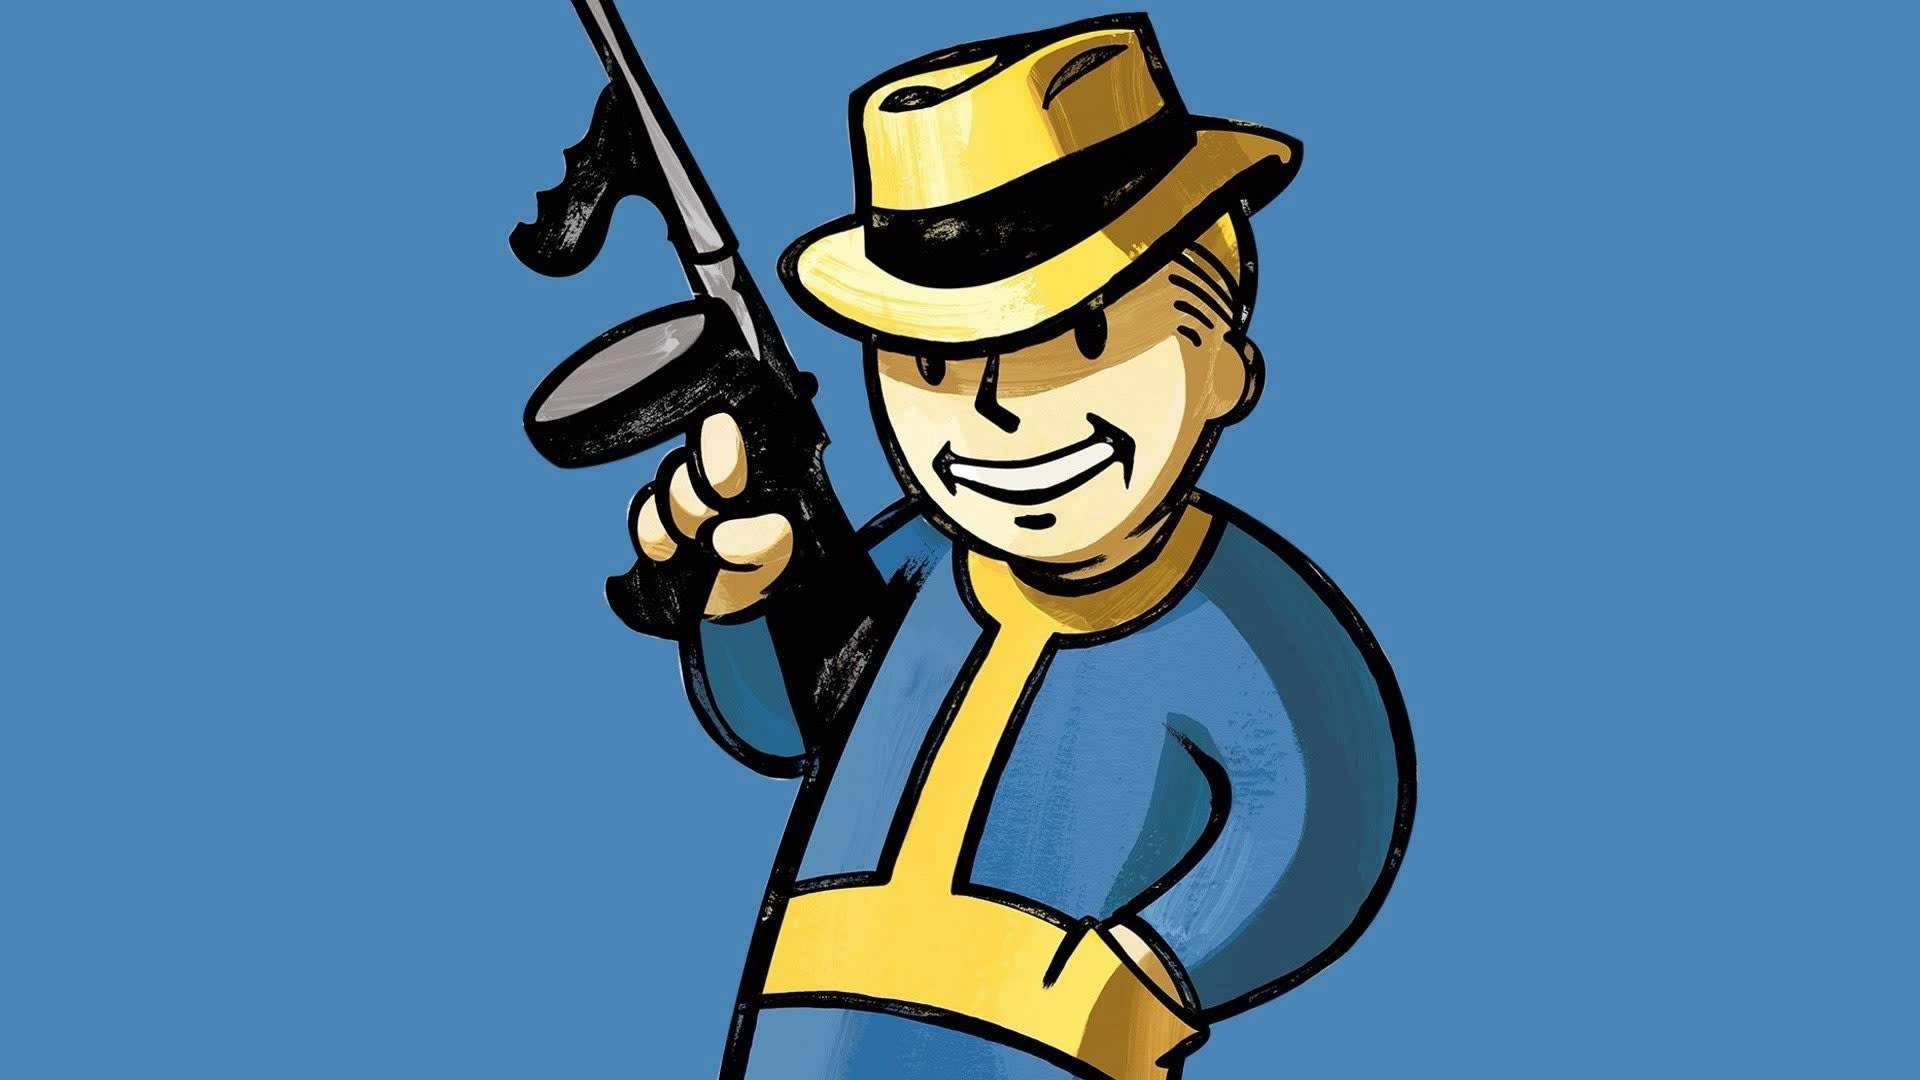 20 godina Fallout serijala